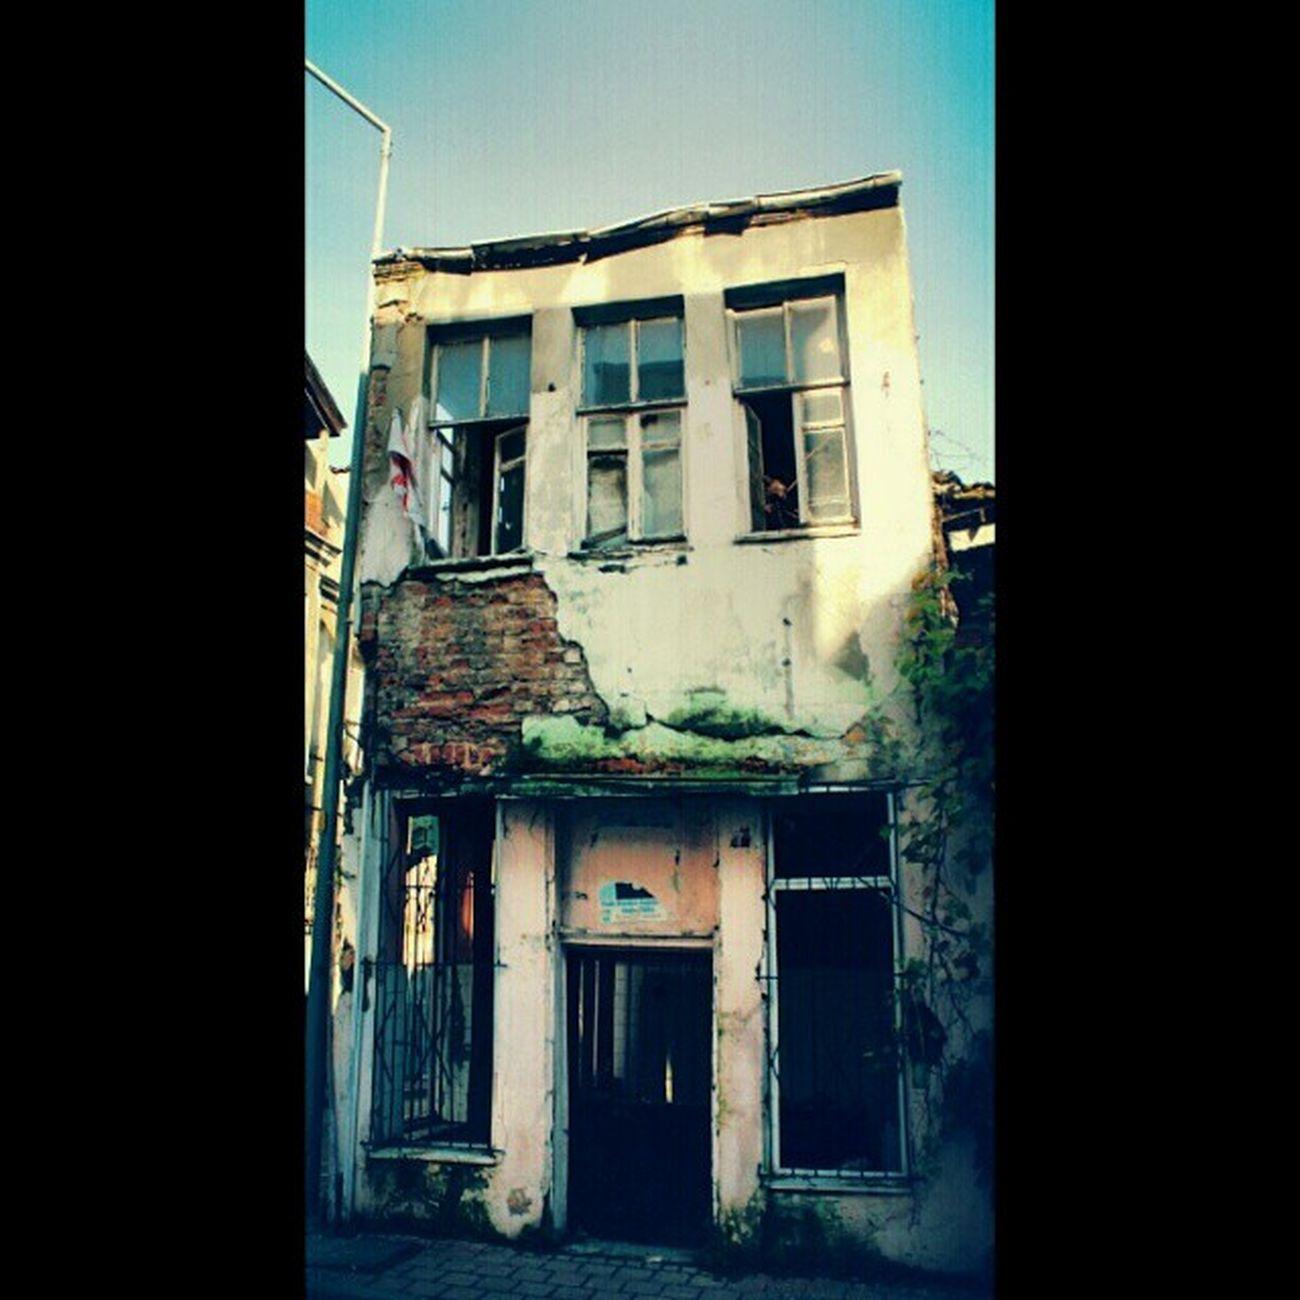 Balat Istanbuldayasam Istanbul Ist_instagram ev eskiistanbul mazi